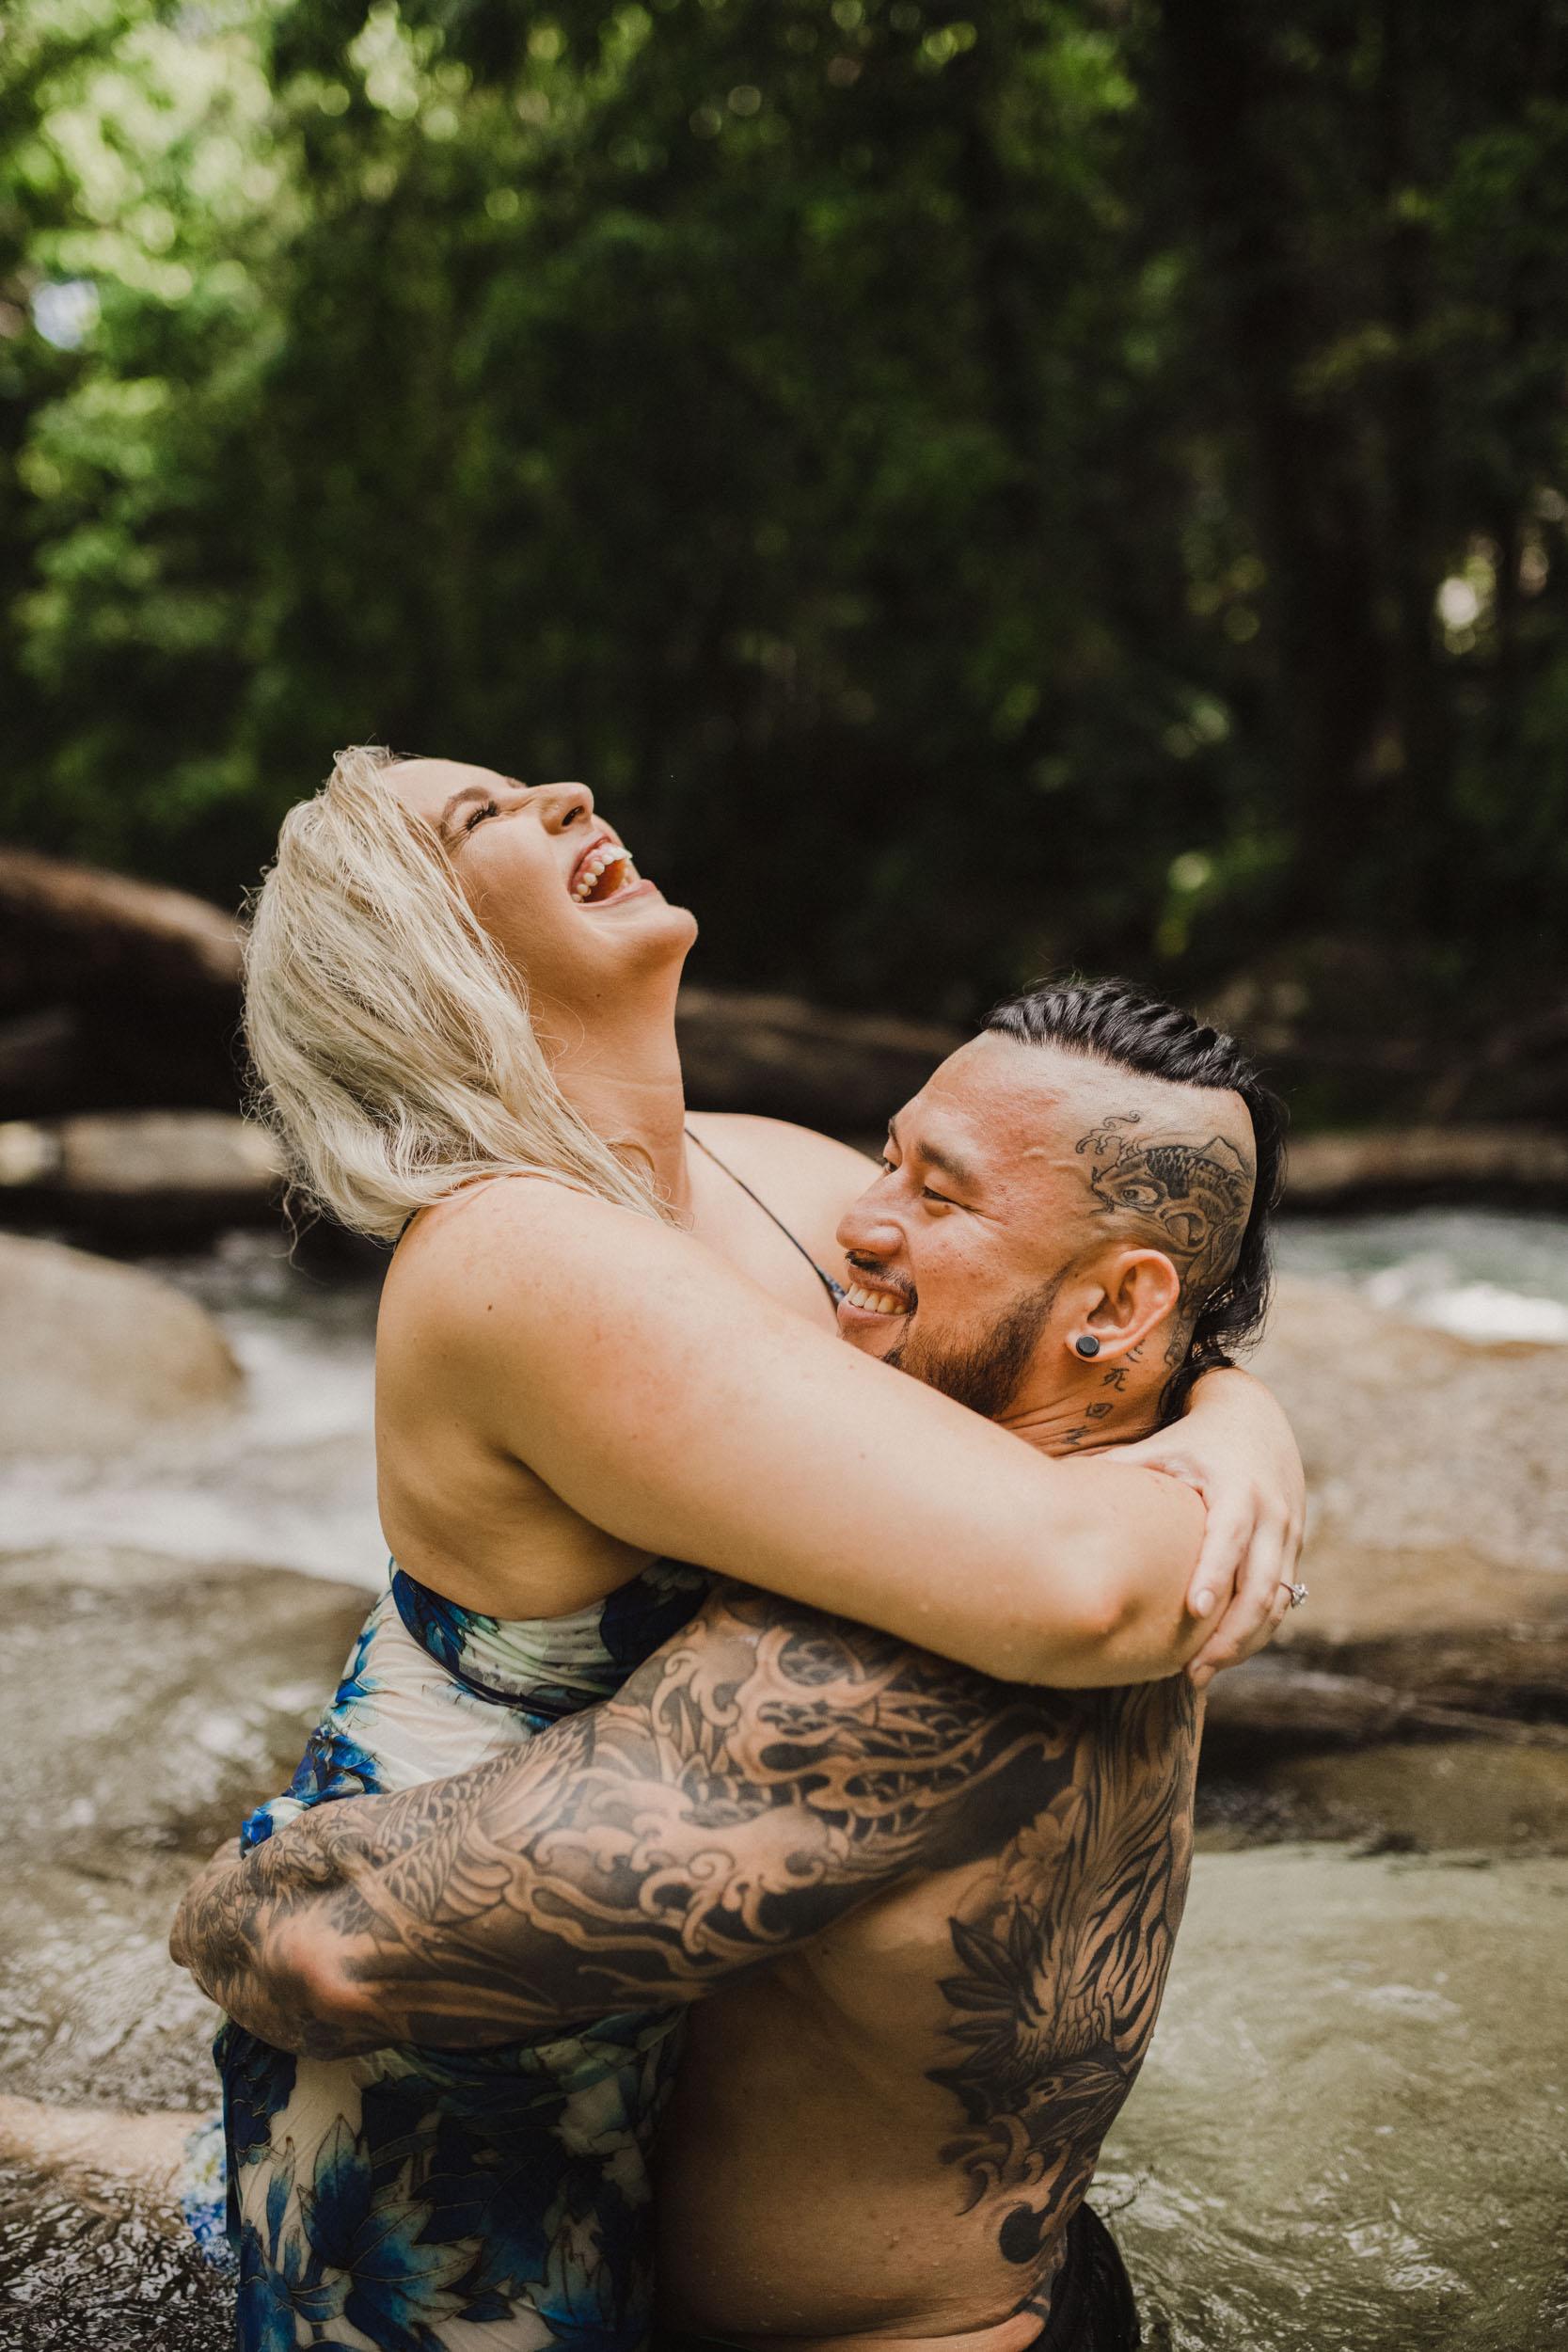 The Raw Photographer - Cairns Wedding Photographer - Rainforest engagement shoot location - Queensland Photography - candid nature-15.jpg